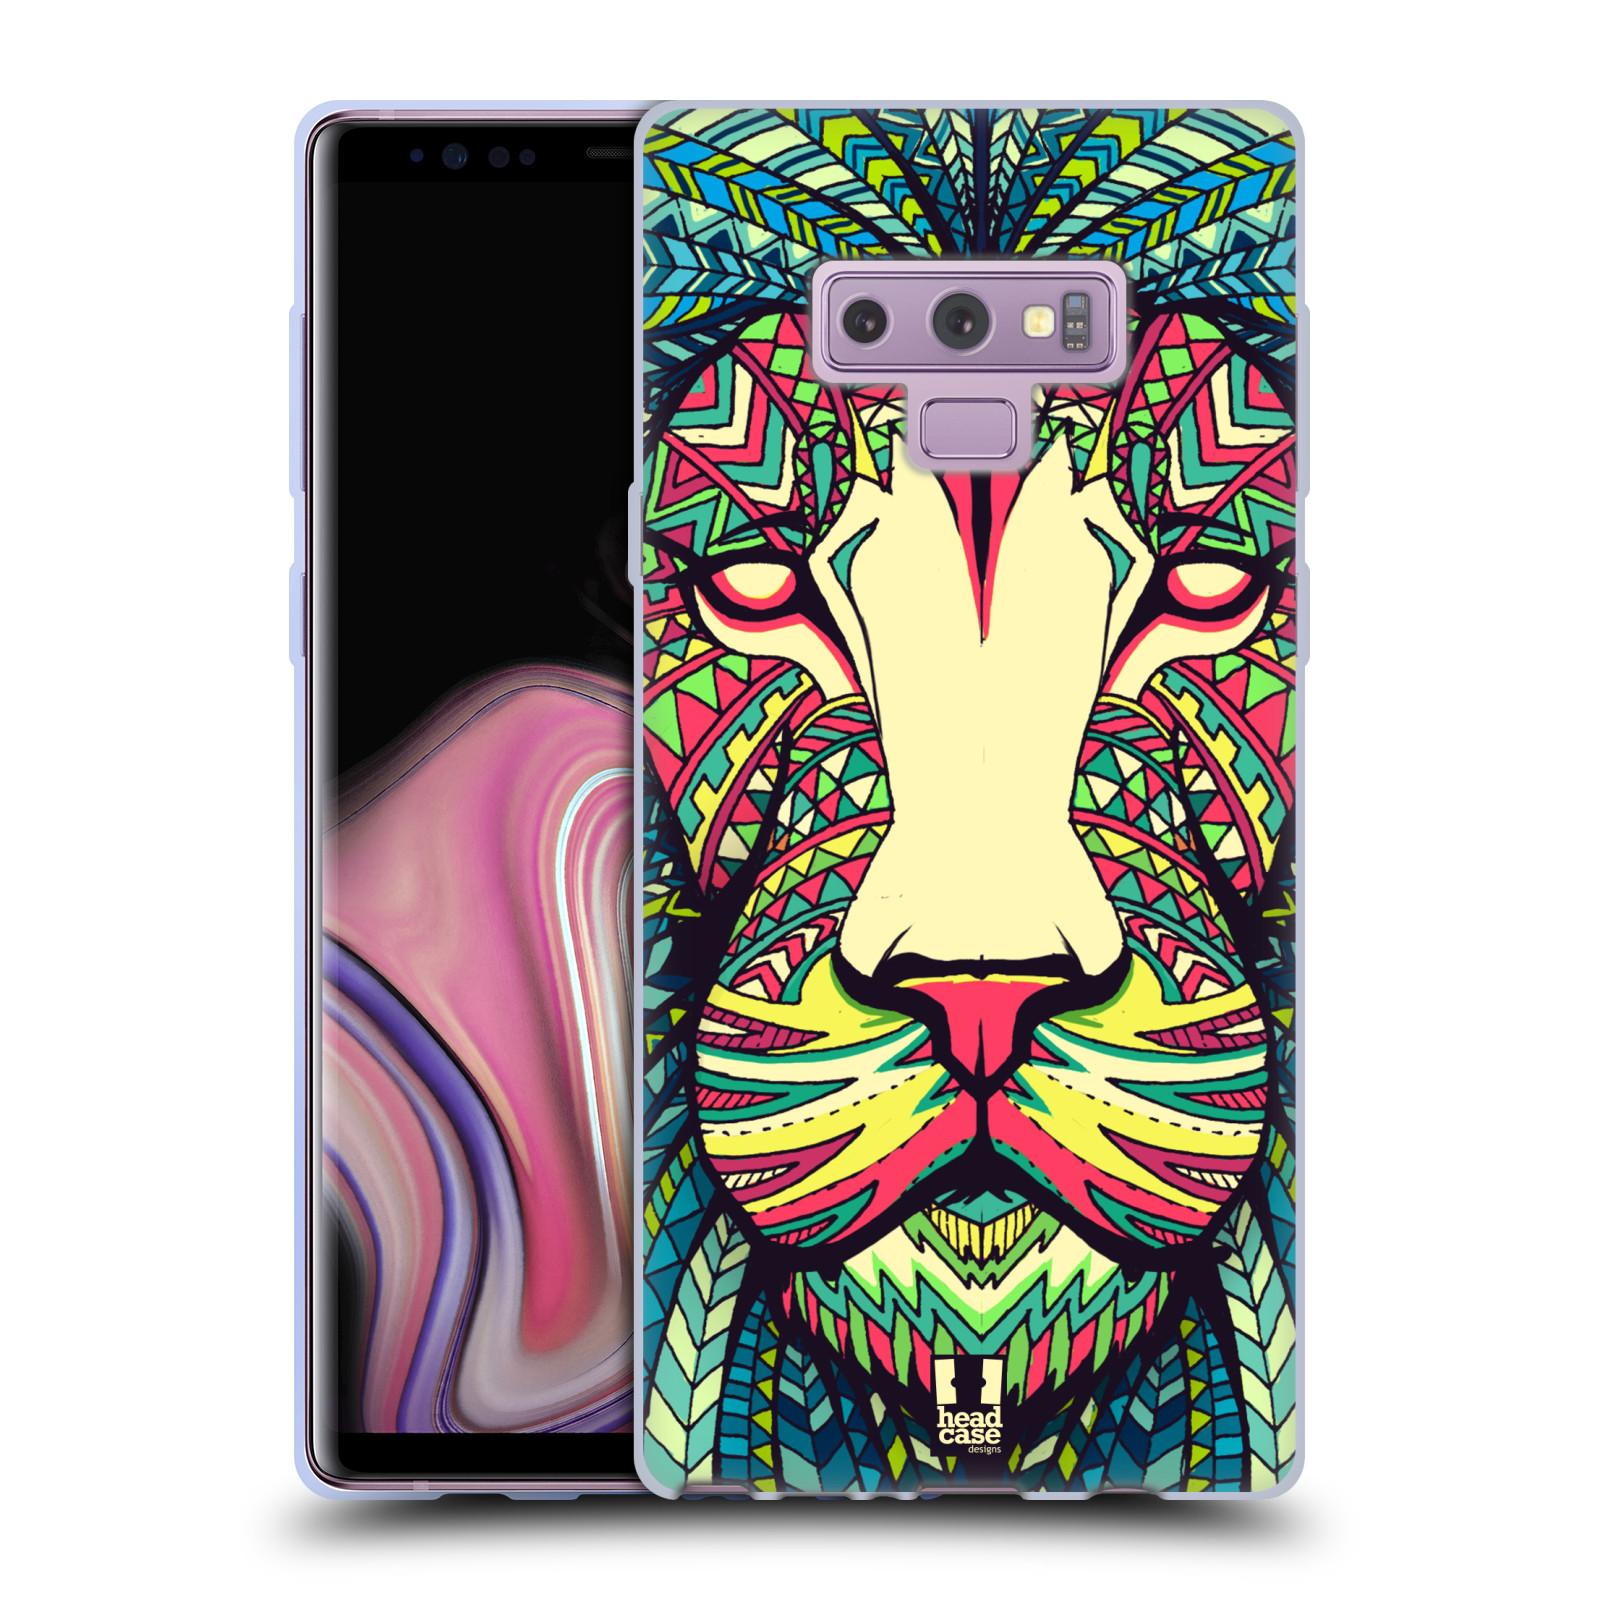 Silikonové pouzdro na mobil Samsung Galaxy Note 9 - Head Case - AZTEC LEV